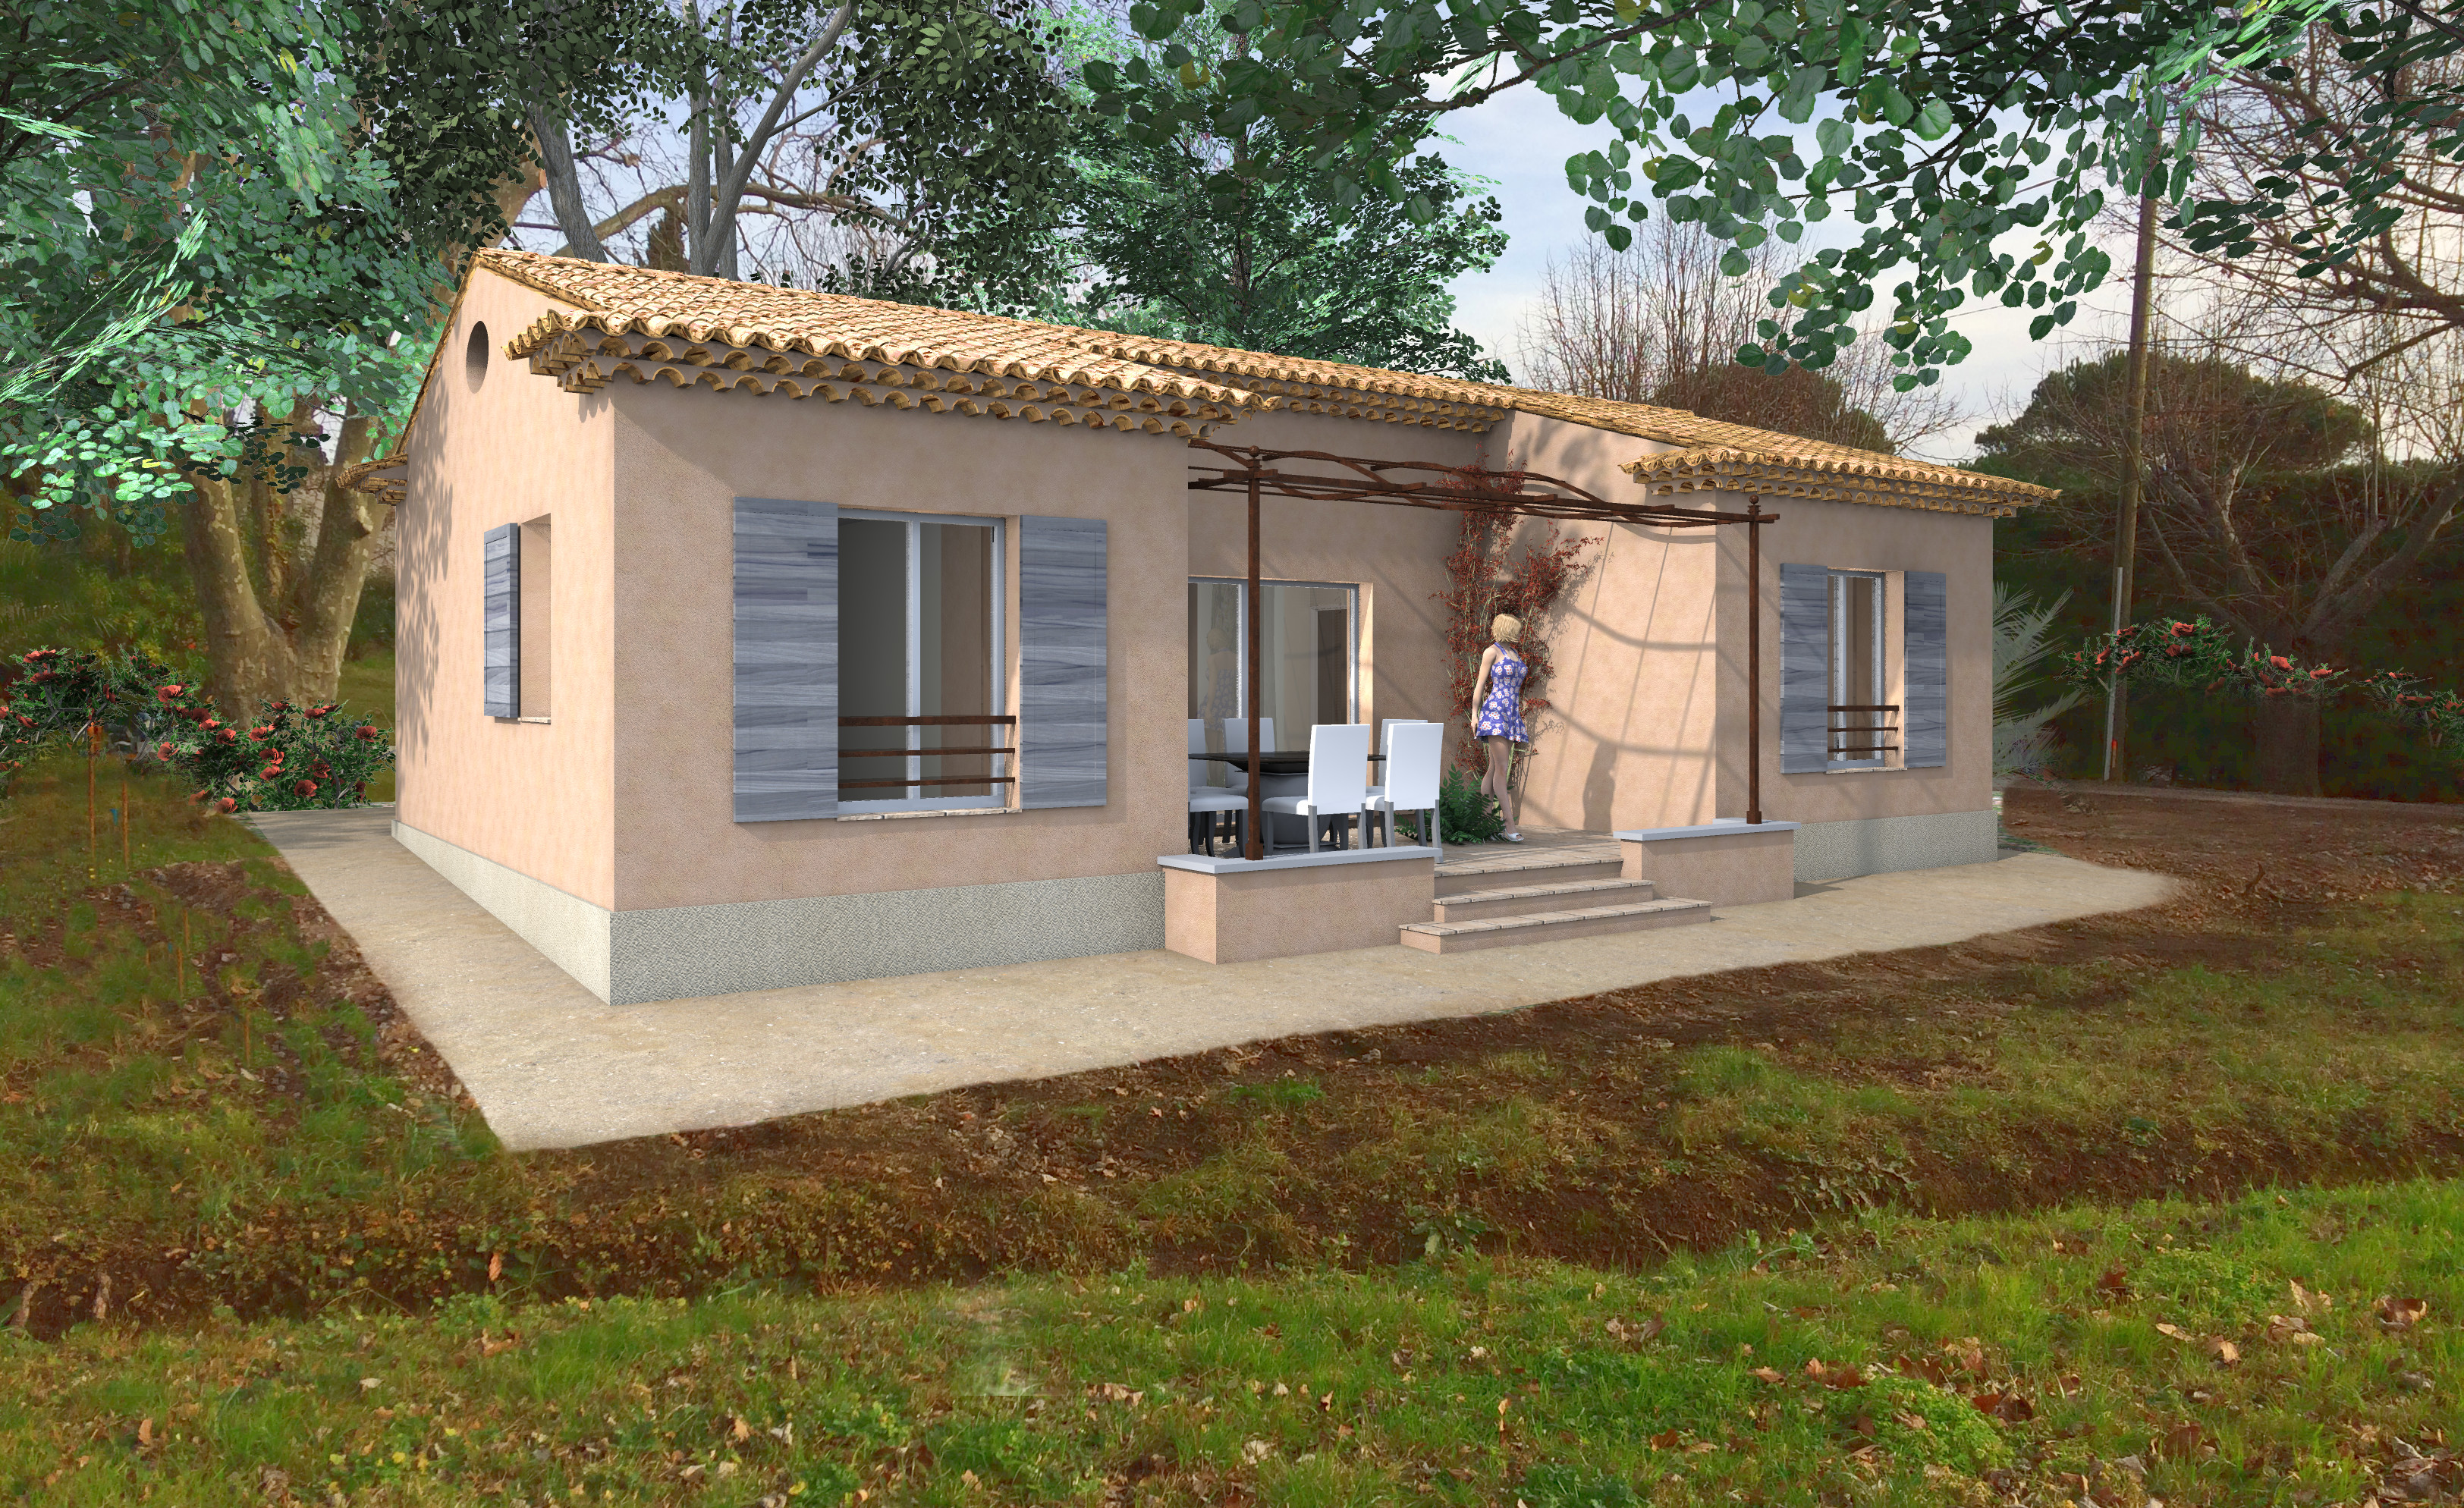 Platanes-villa-location-vacance-agay-saint-raphael-var